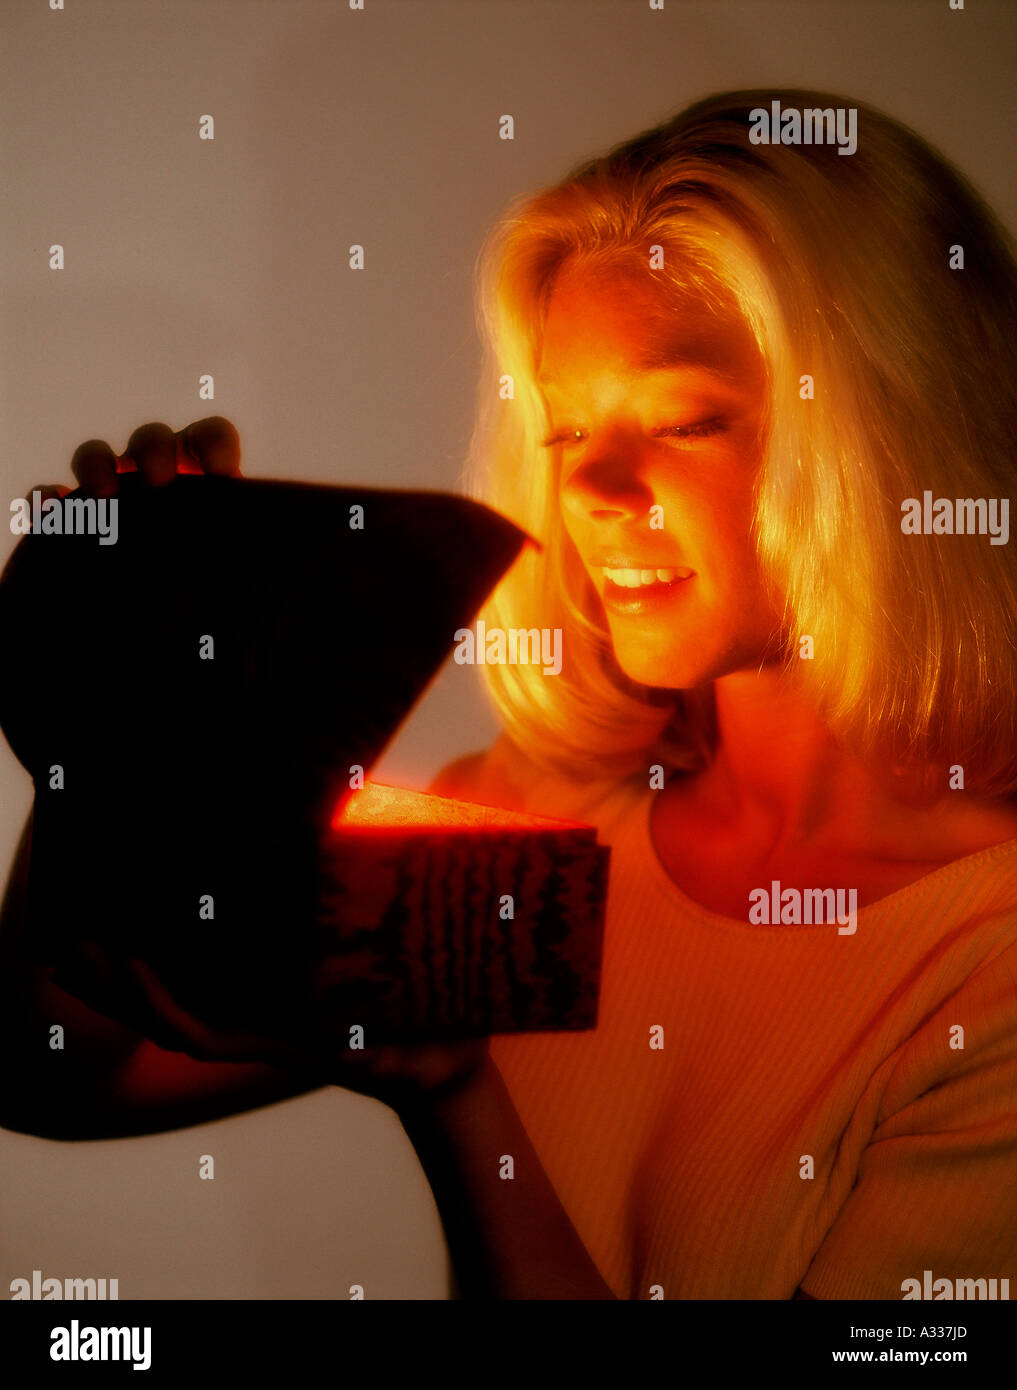 Mysterious glowing box 3F4 - Stock Image